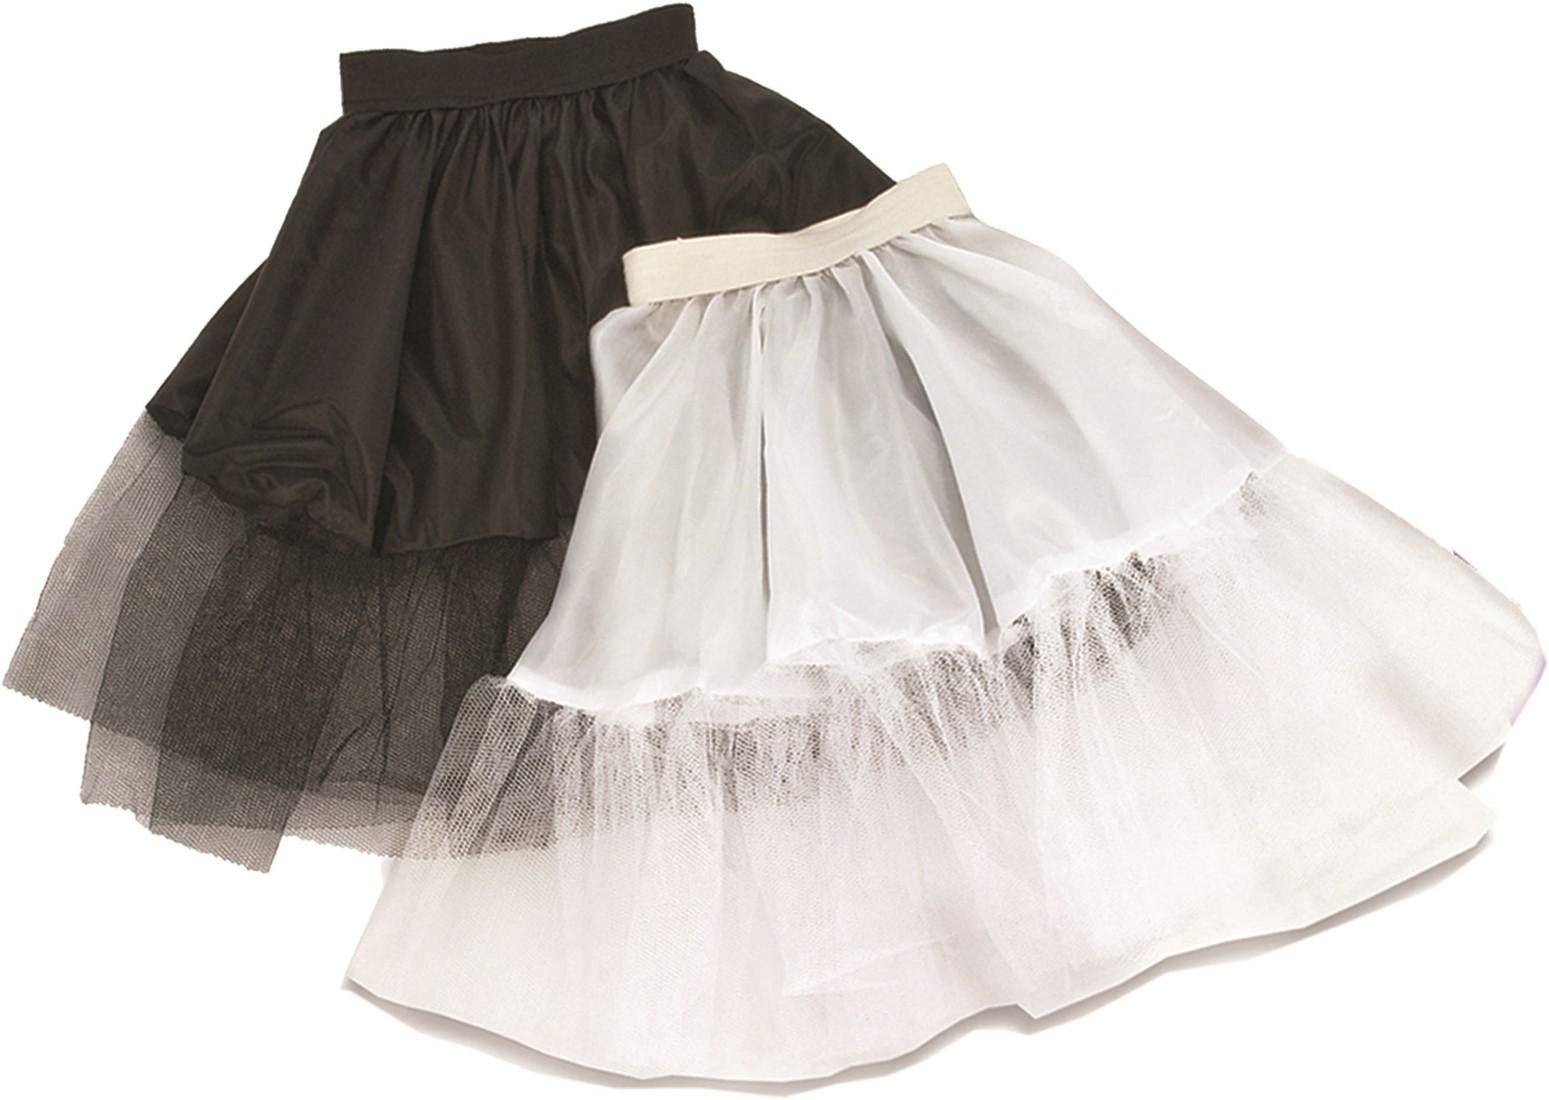 d6dcacd7846 Petticoat Zwart | Carnavalsland